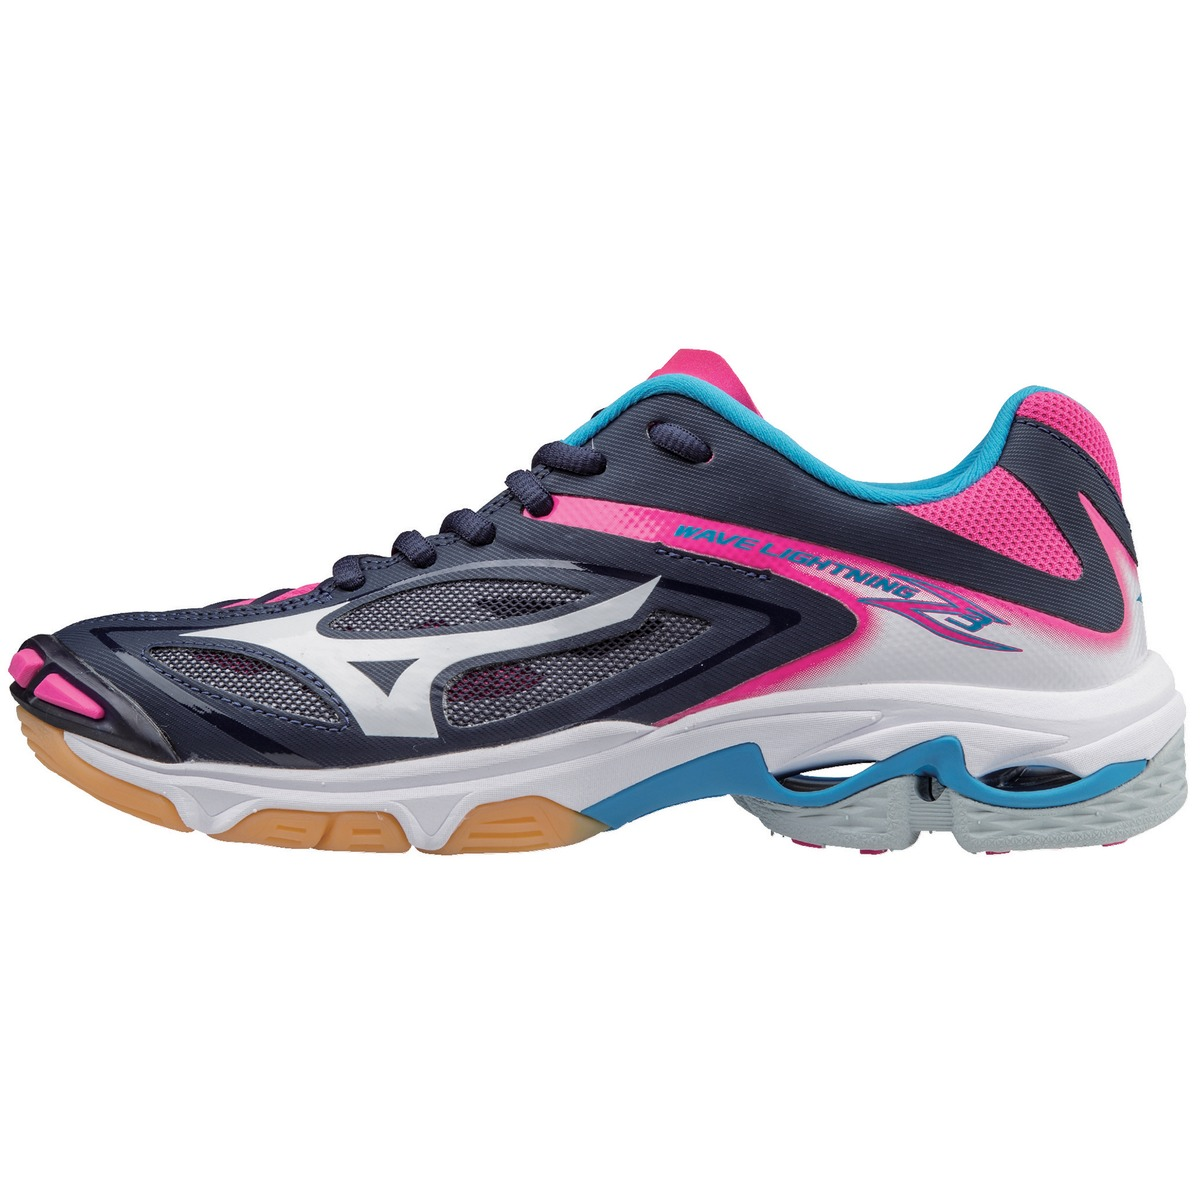 642fd60b Buy mizuno wave lightning z w rosa lime 7 meget stabil innendørssko ...